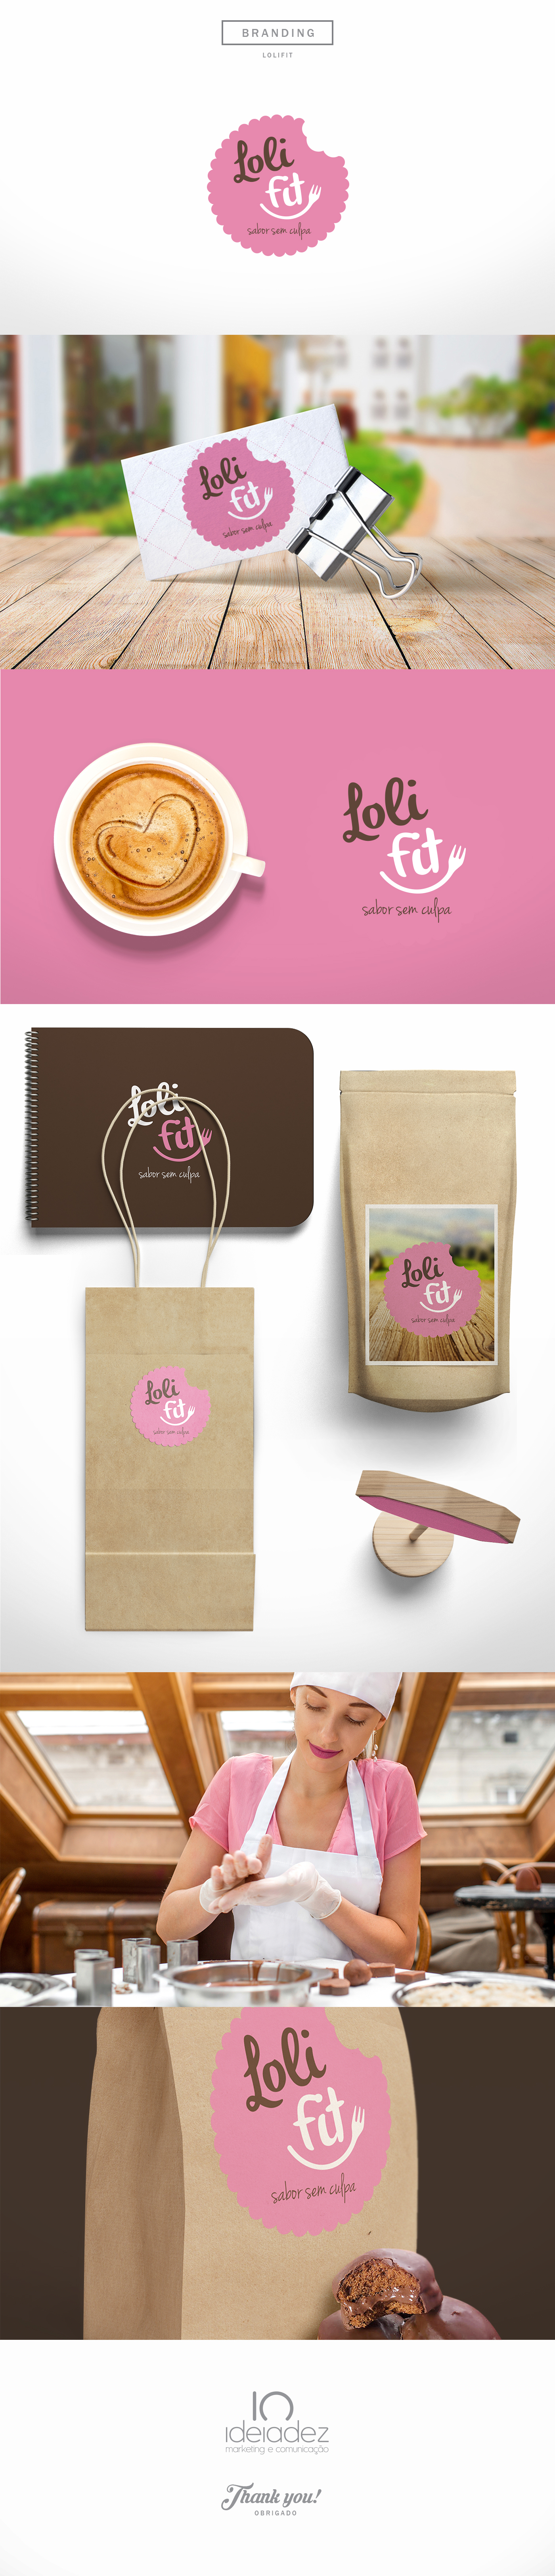 LoliFit FitDesing Candy pink foodbranding brandingdesign Mockup mockupdesign logo